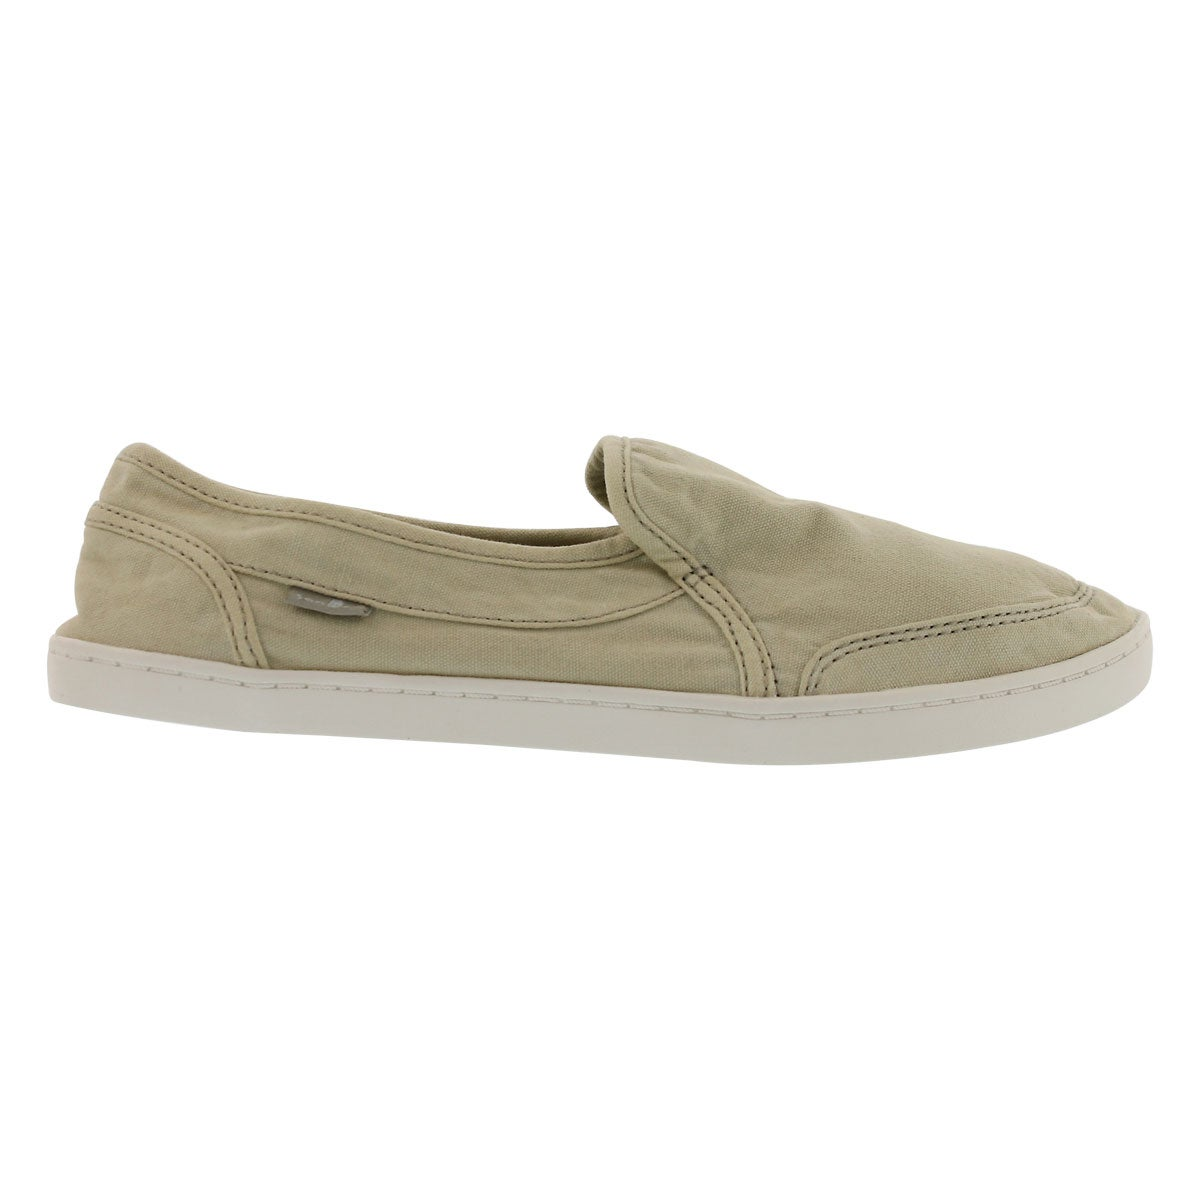 Lds Pair O Dice naural slip on shoe